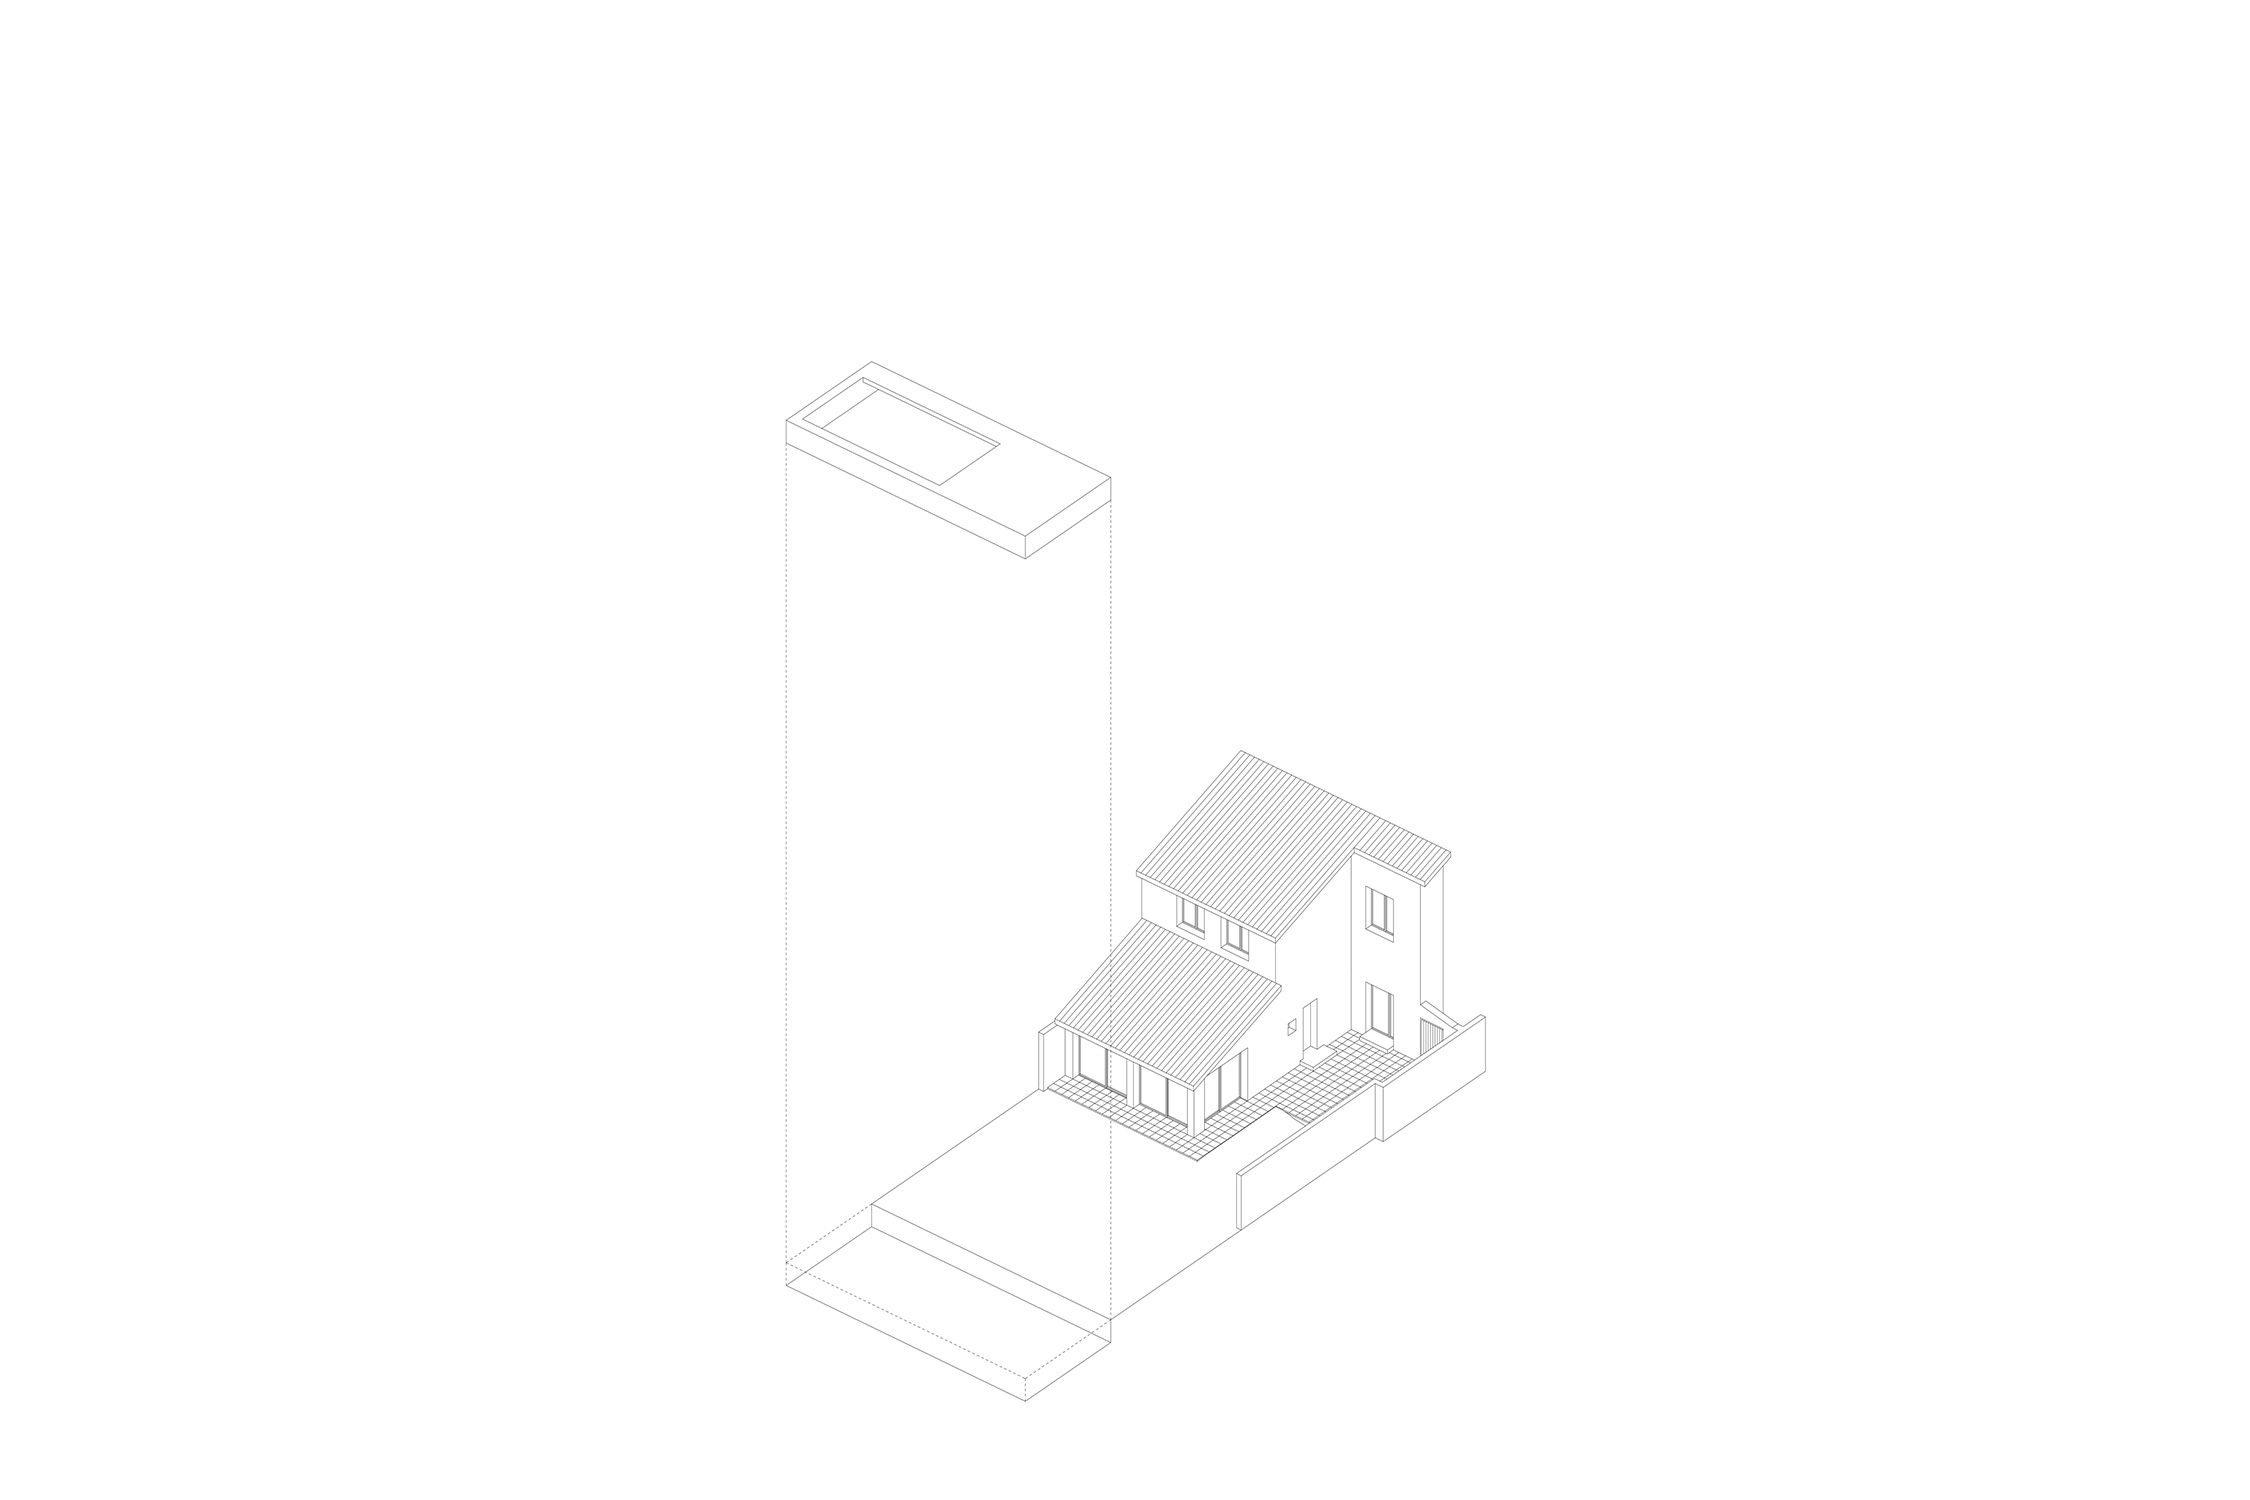 archaic_BAST_AtelierM21_18.jpg